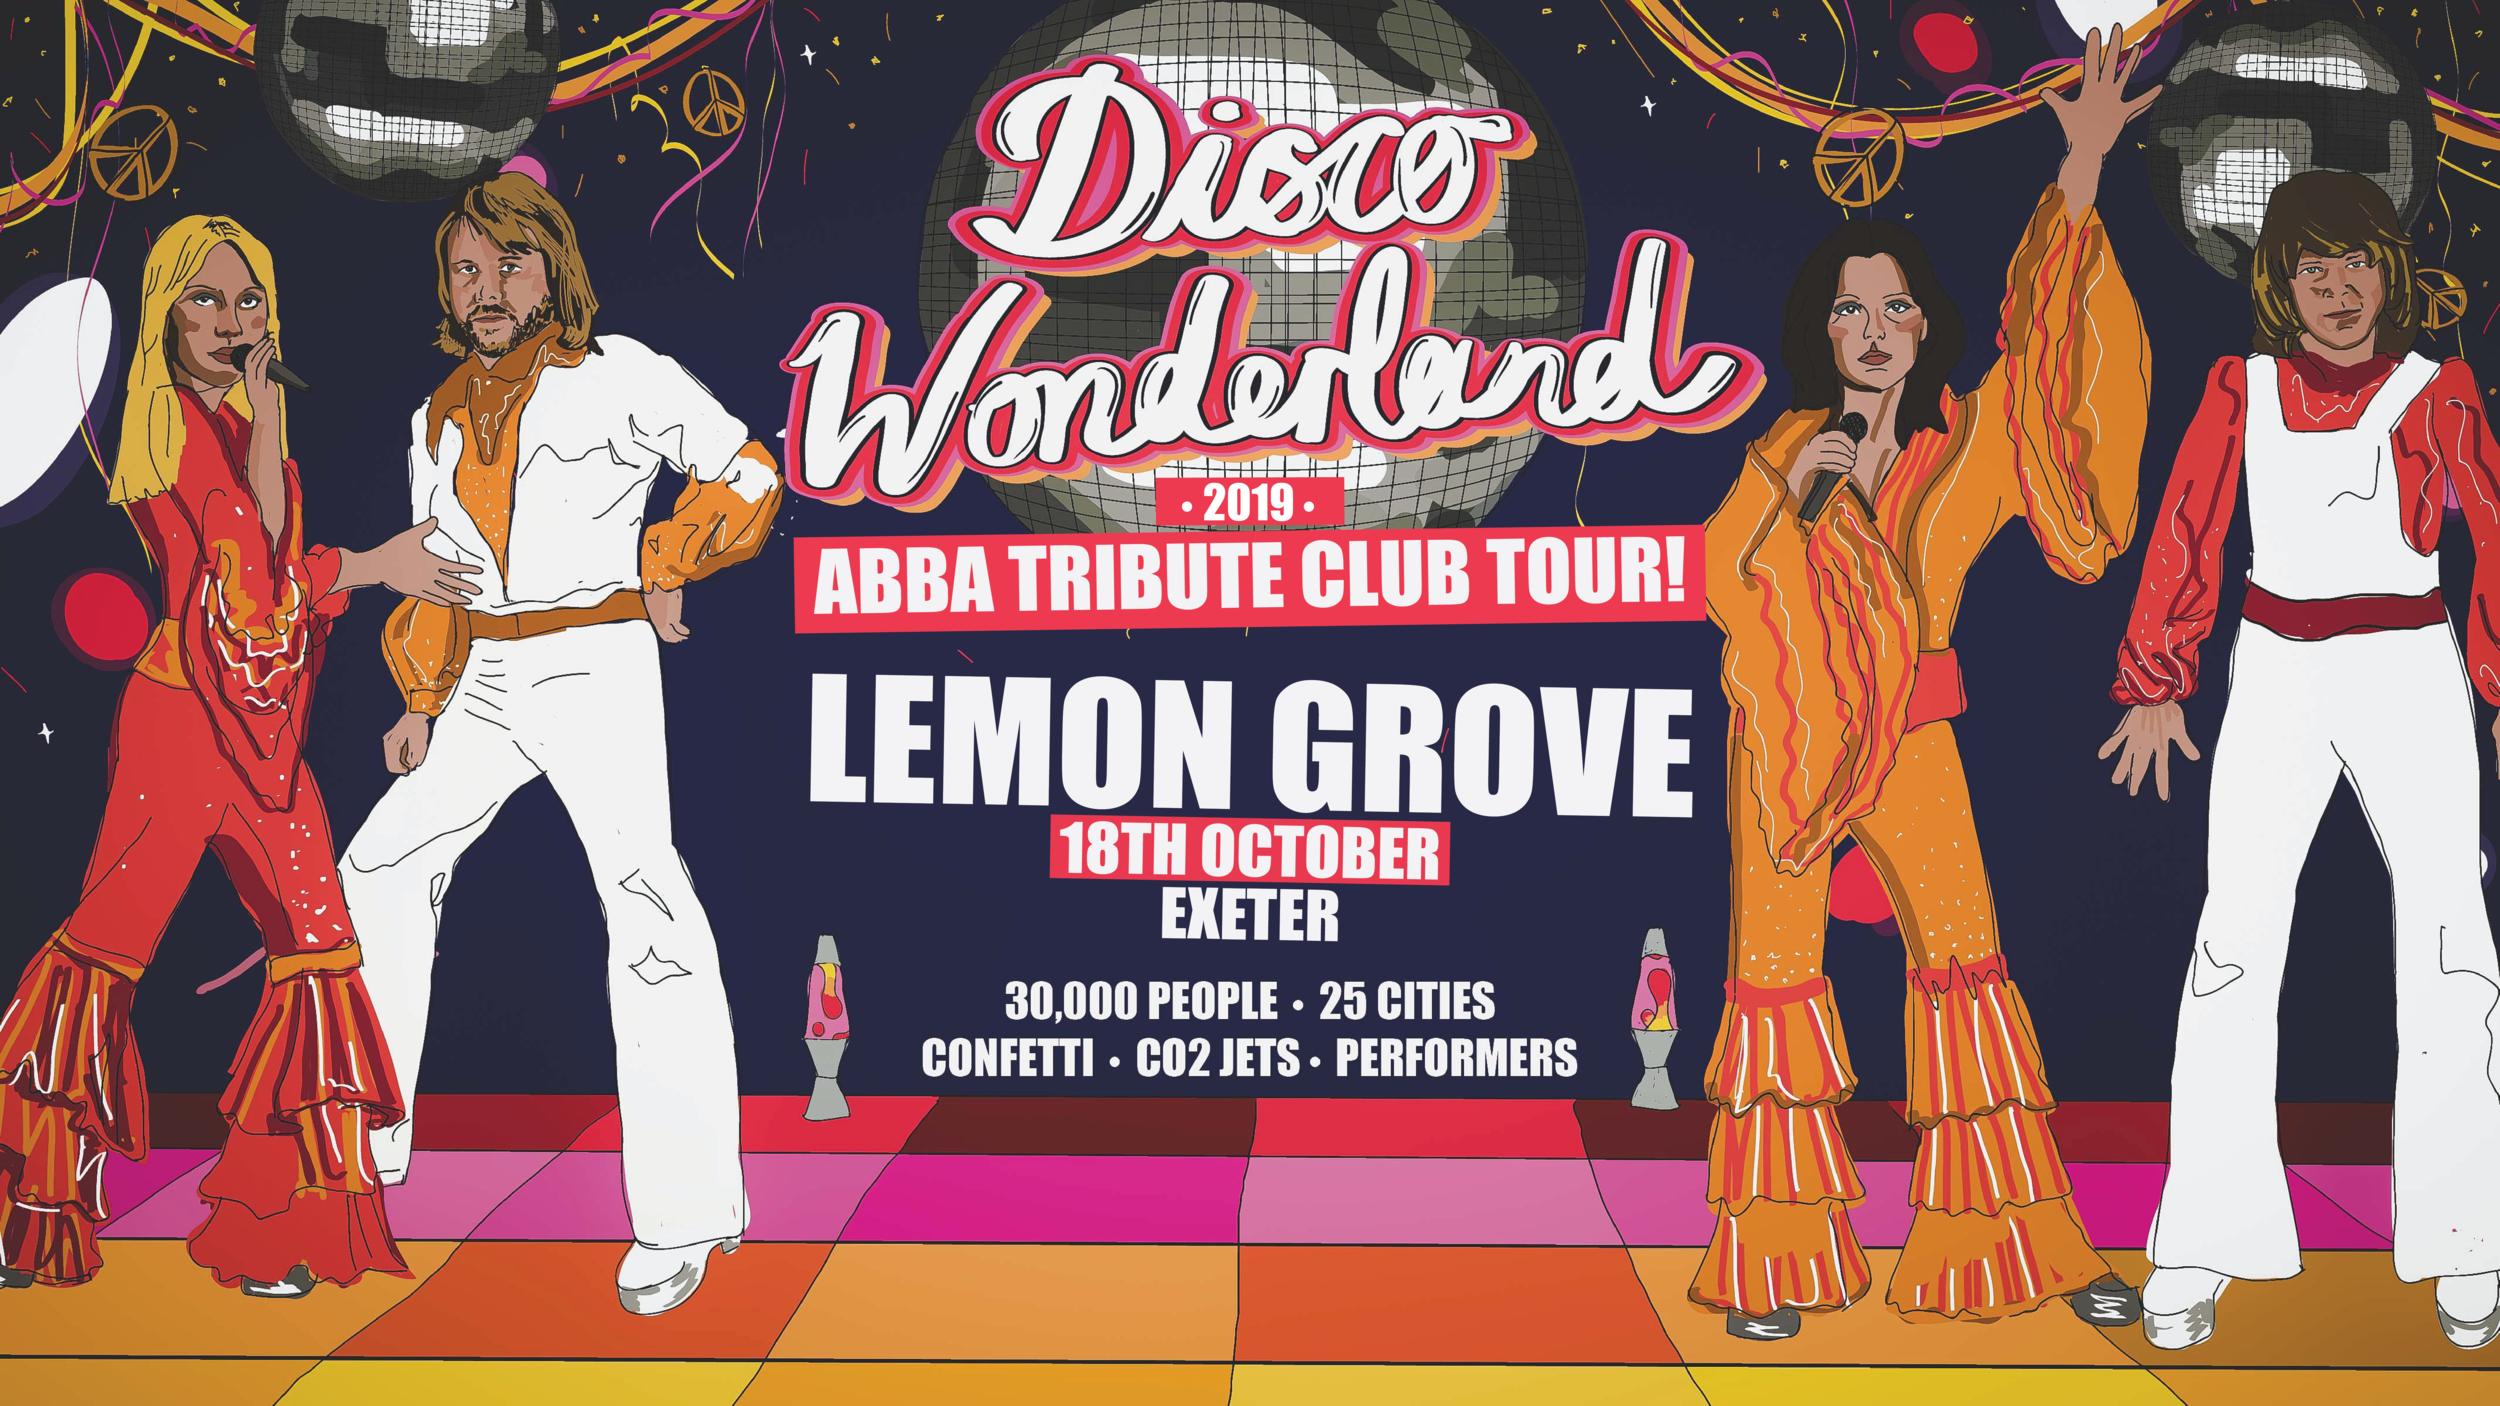 Disco Wonderland - 18 October